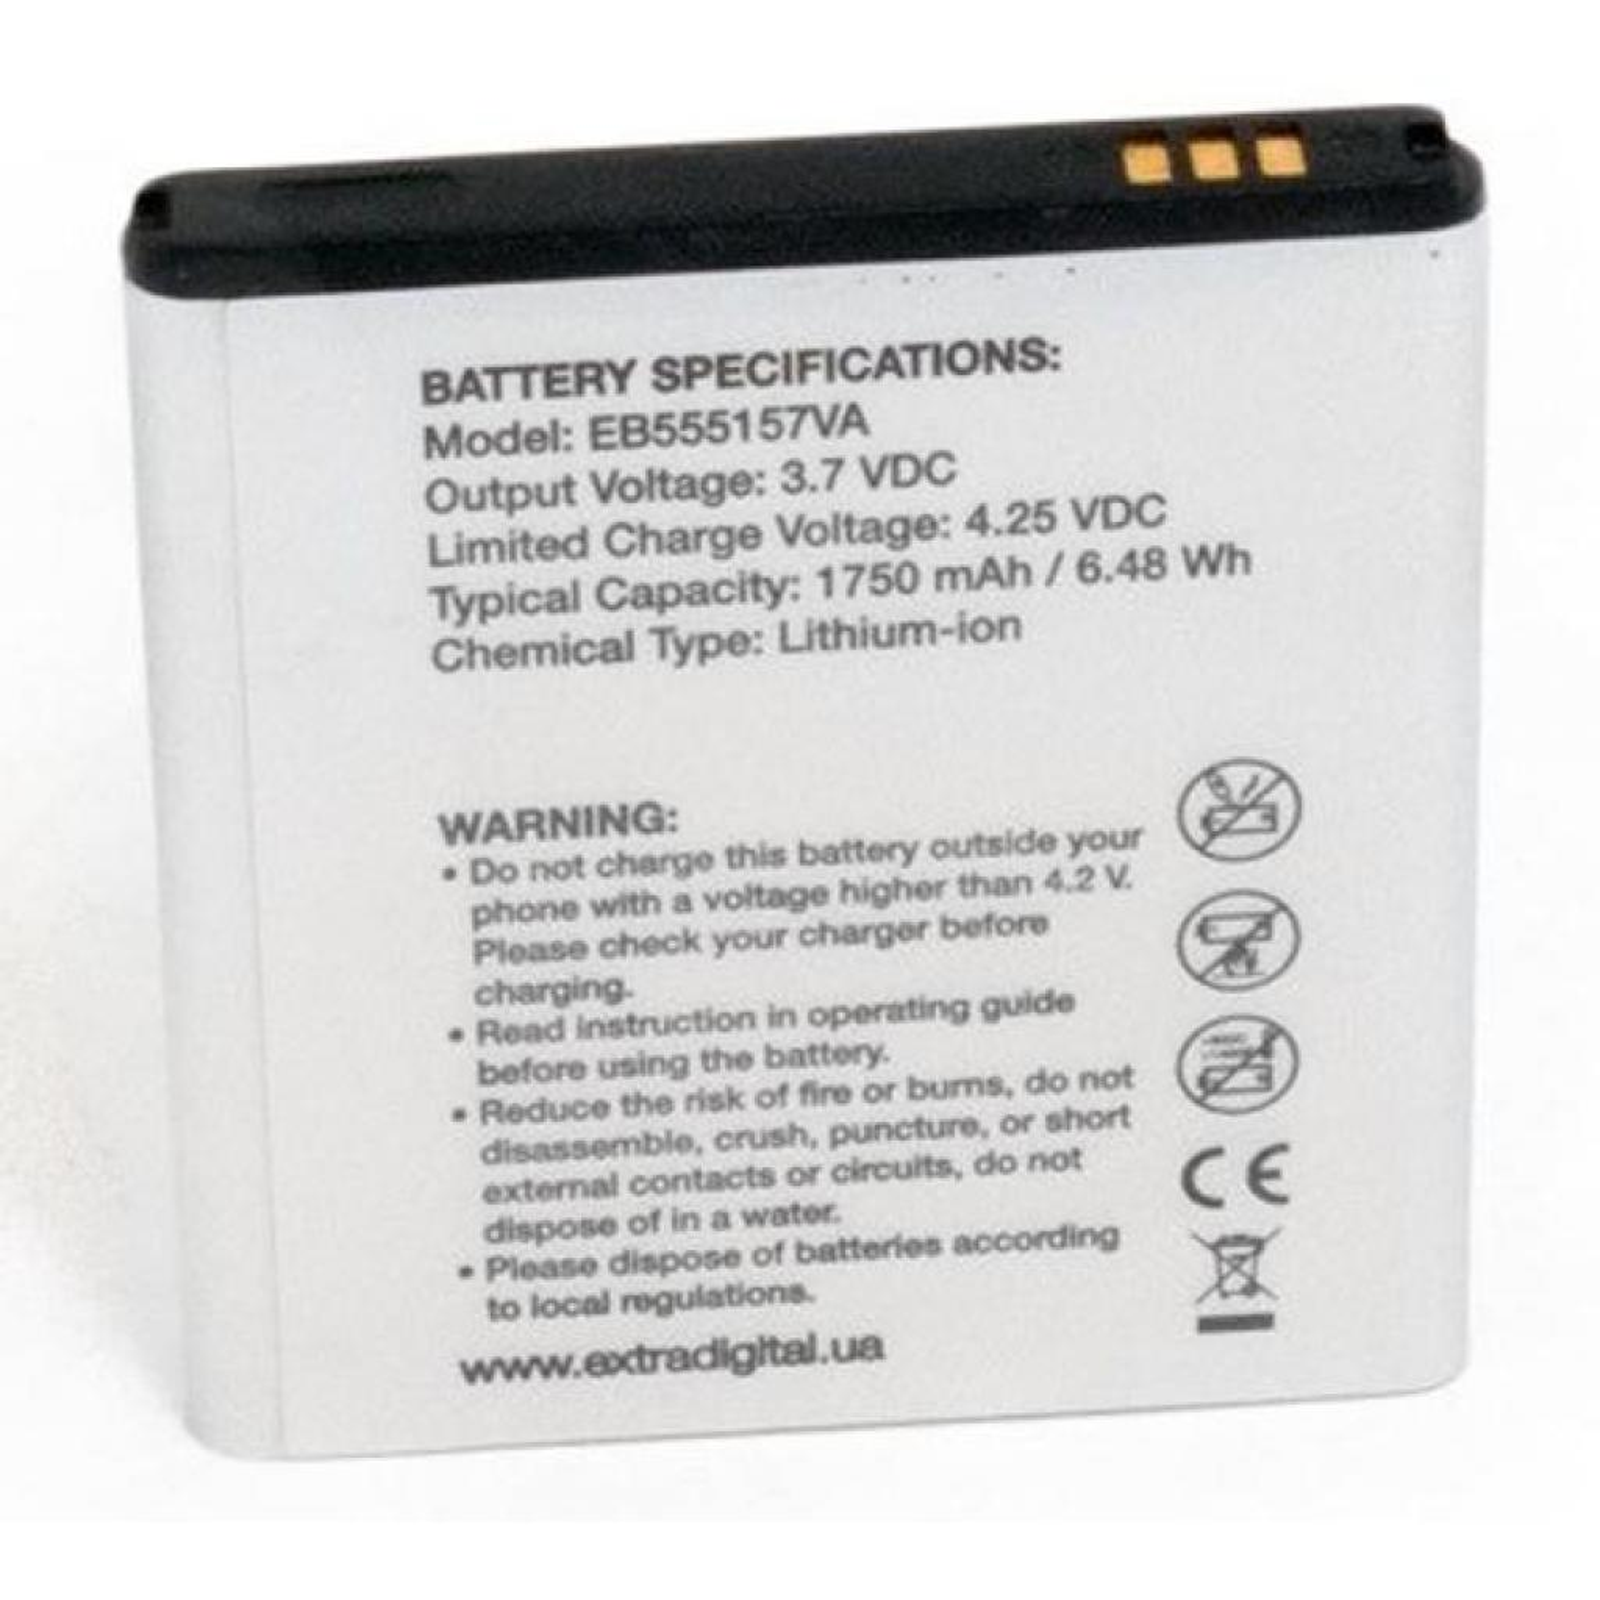 Аккумуляторная батарея EXTRADIGITAL Samsung SGH-i997 Galaxy S Infuse 4G (1750 mAh, EB555157VA) (BMS6331) изображение 2